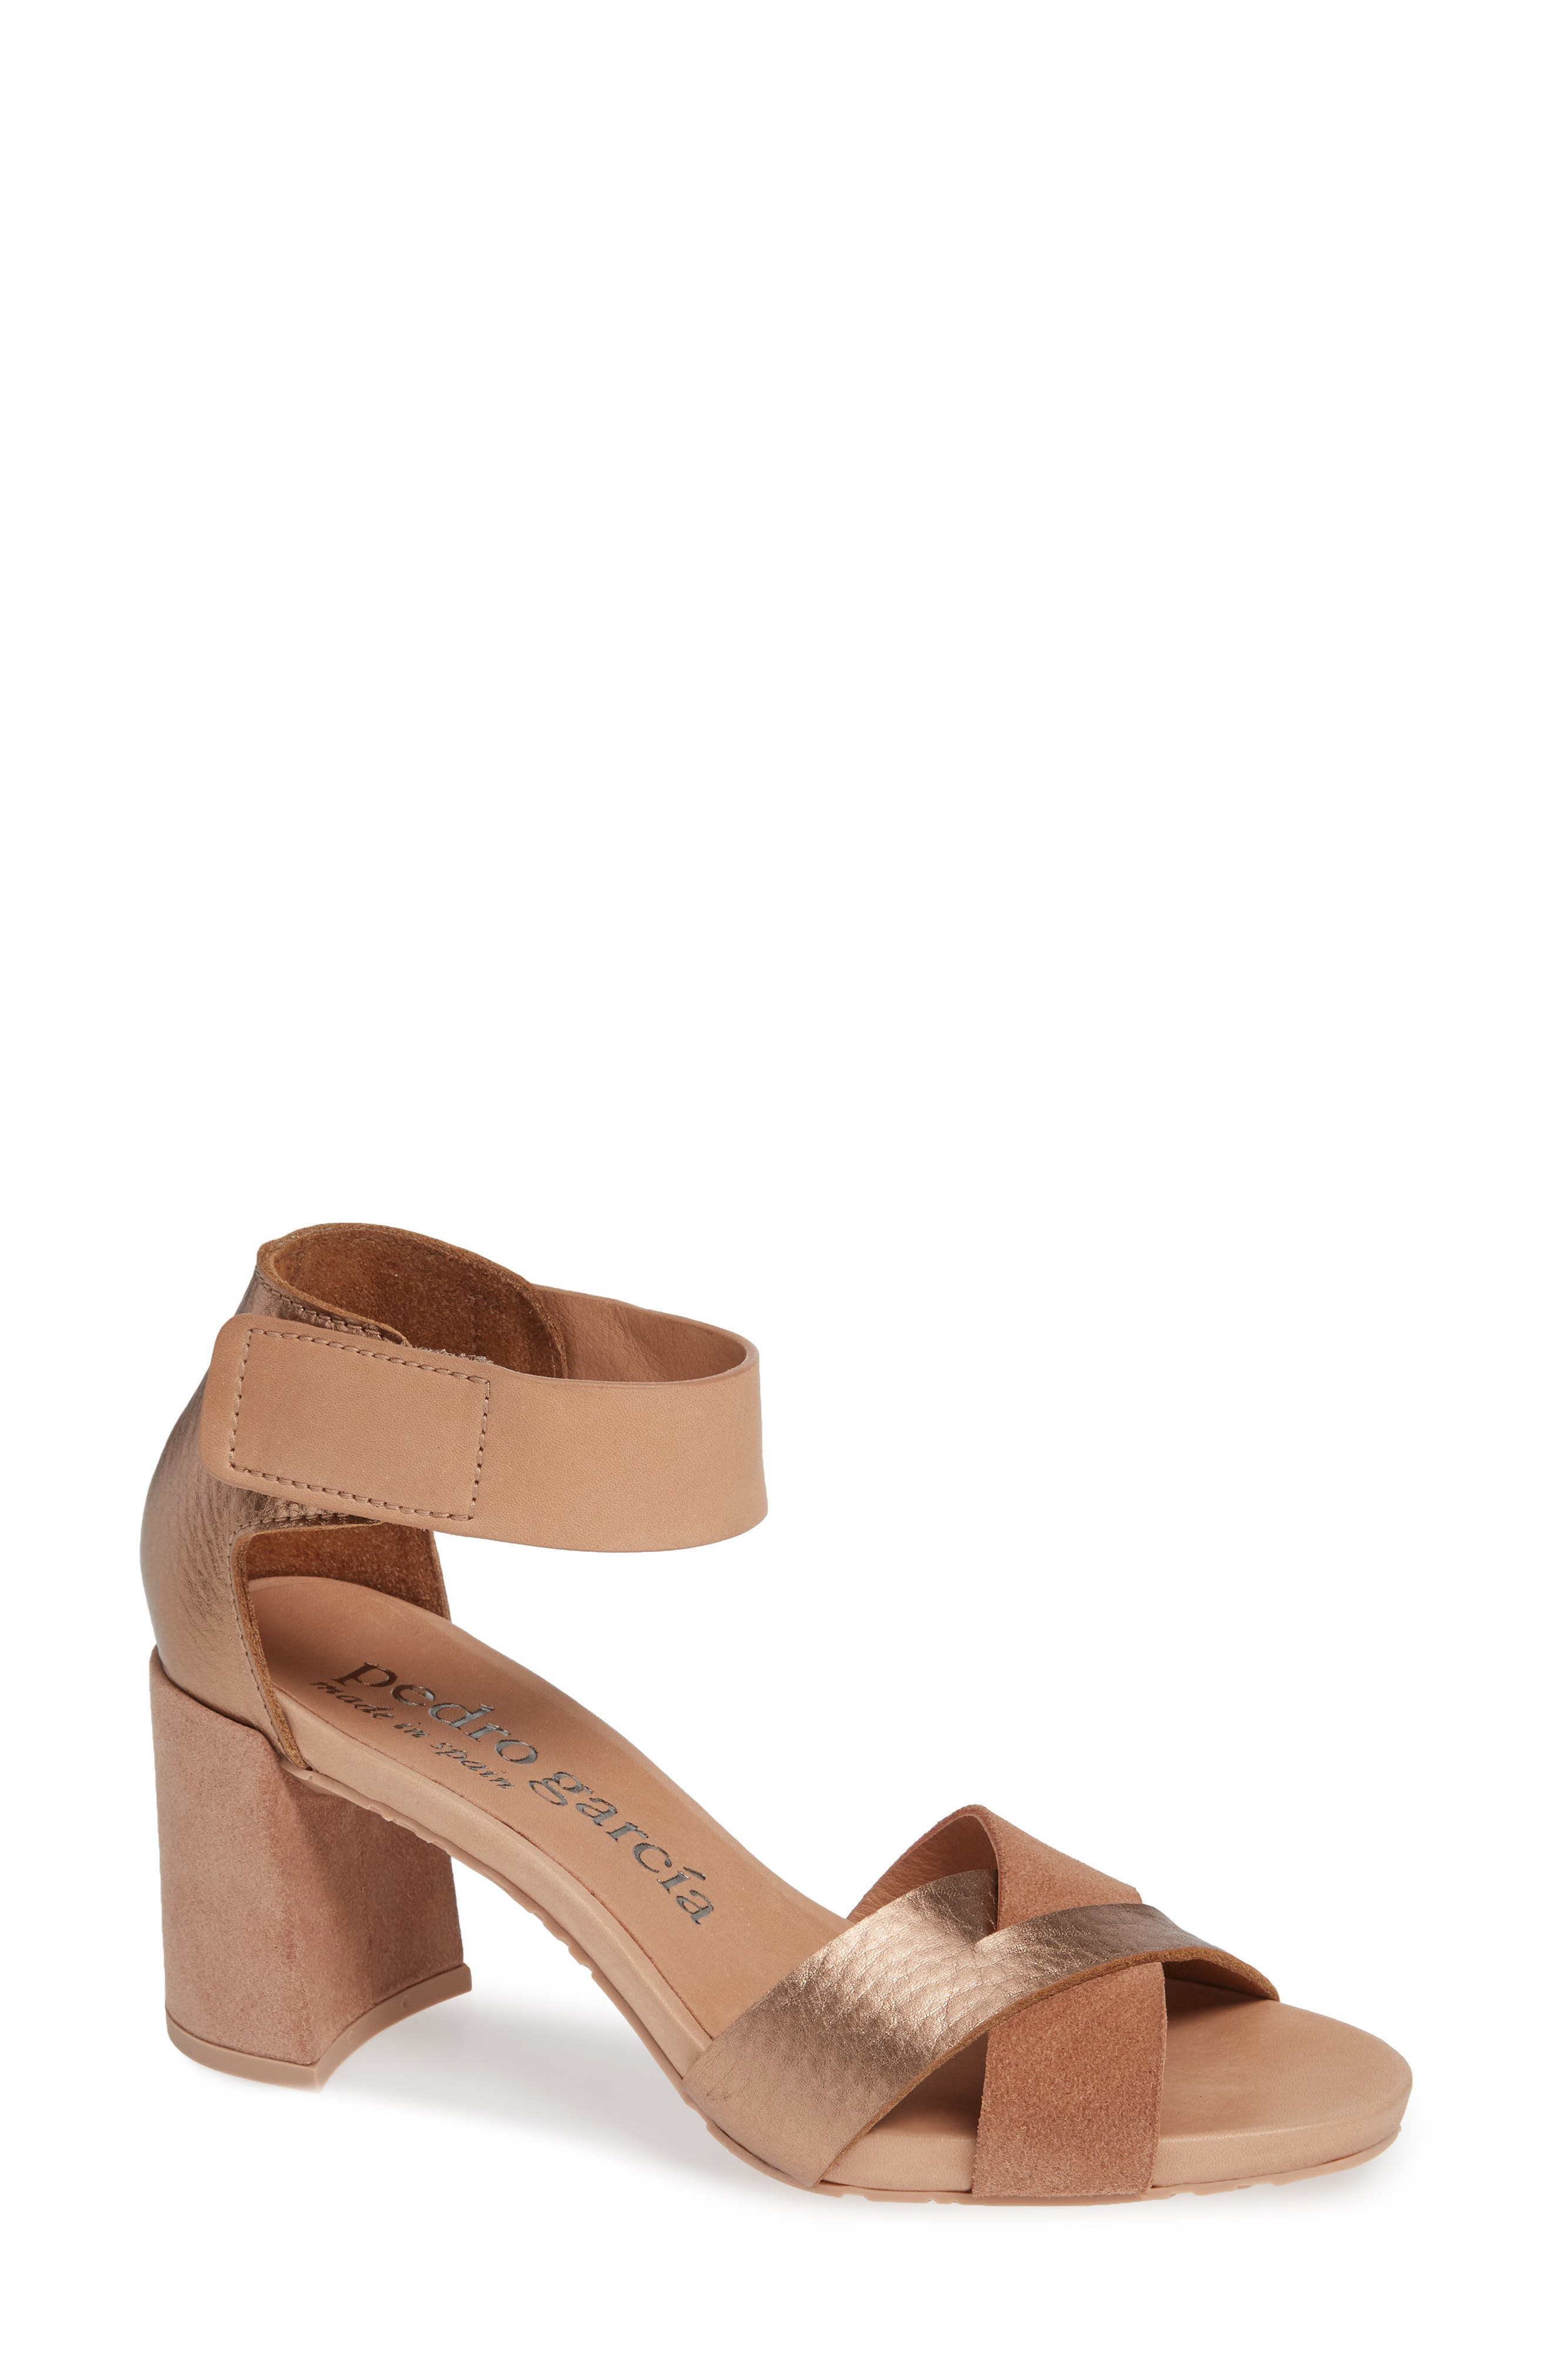 PEDRO GARCIA Whimsy Ankle Cuff Sandal, Main, color, ROSE CERVO LAME